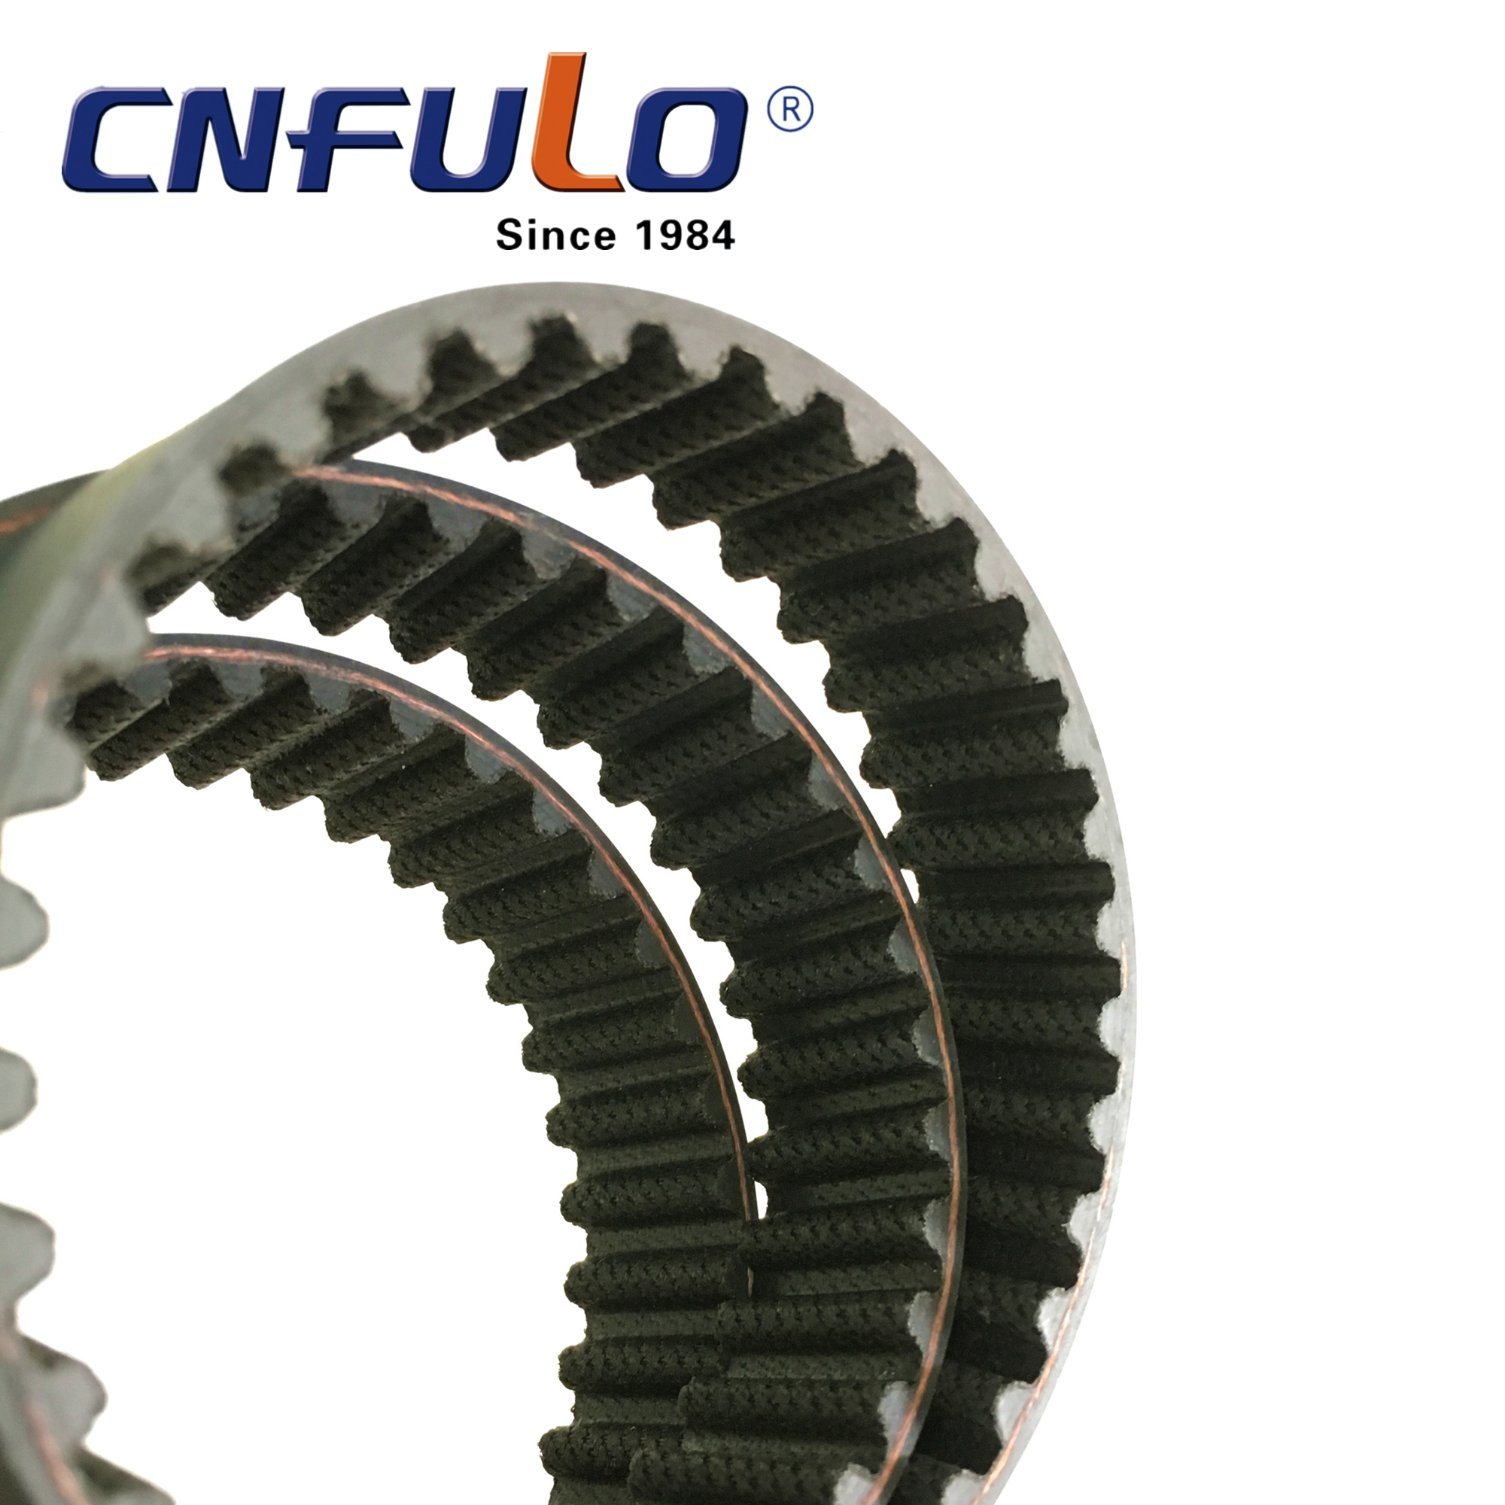 China New Polo 16l Timing Belt Engine Cfb Bh 12118 Kia Rio 1 6l Automotive Belts